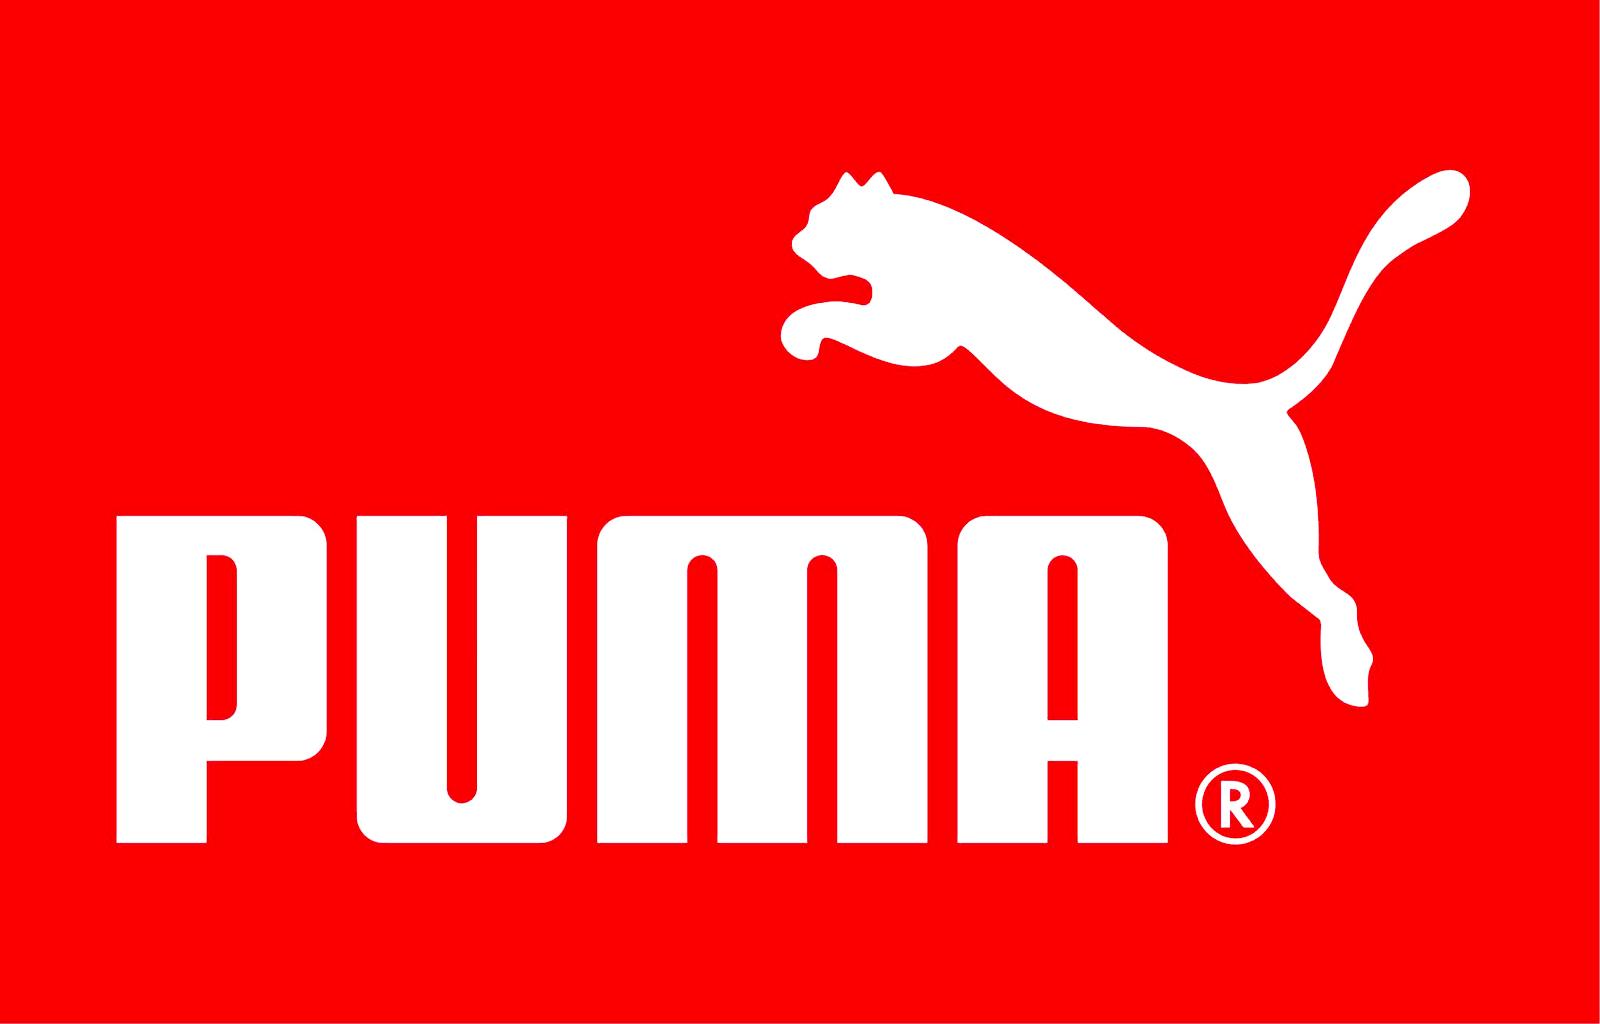 883a183fc959 Puma sport company logo papers works fake puma logo jpg 1600x1024 Fake puma  logo